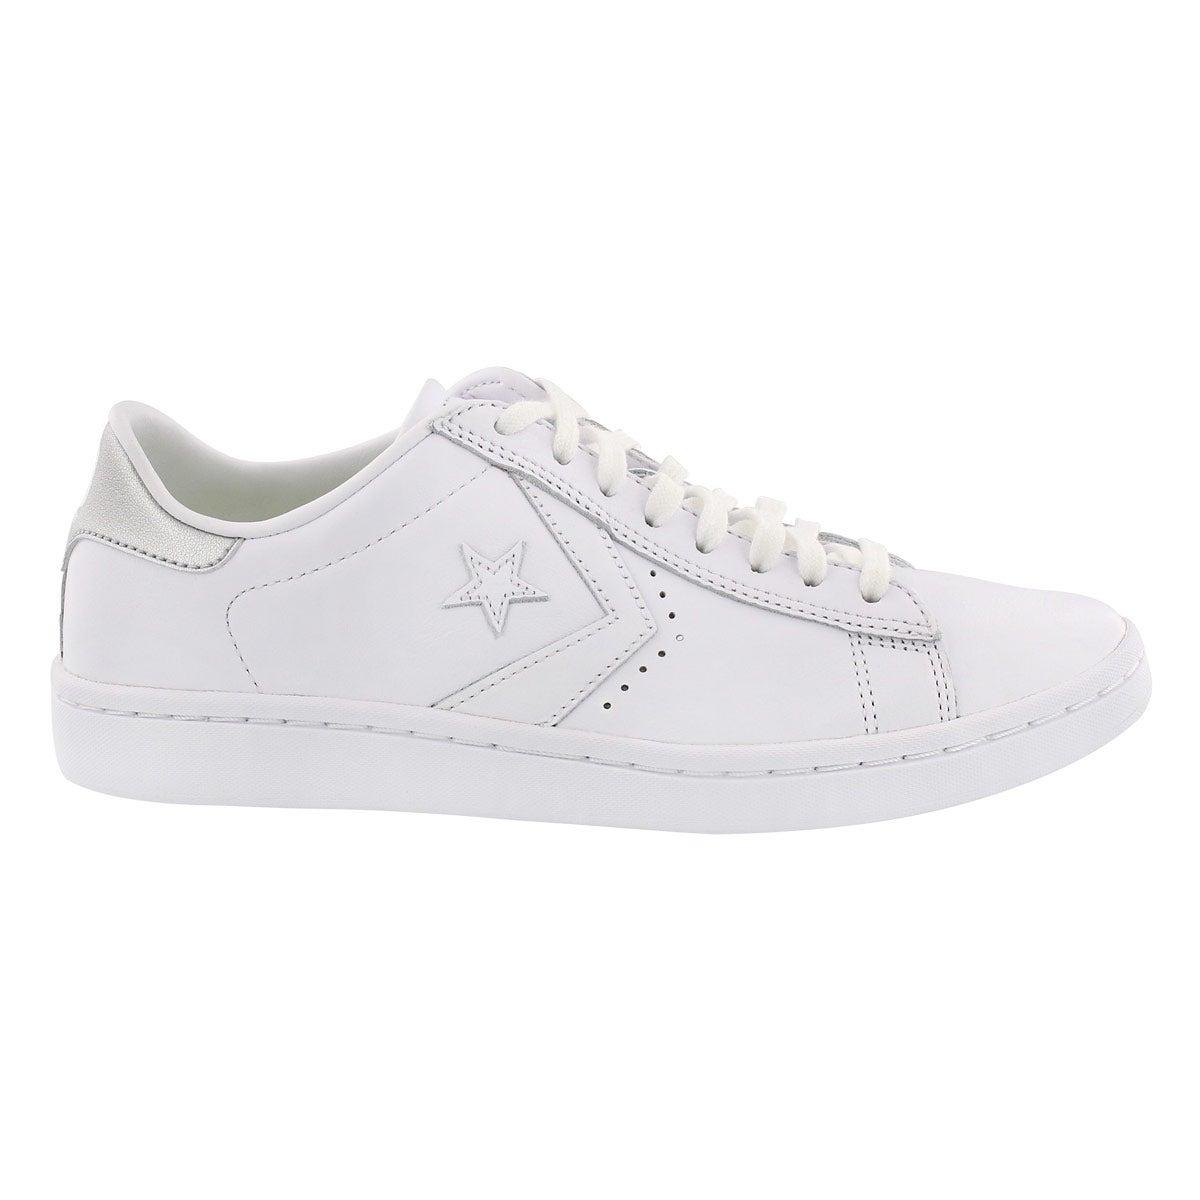 Lds PL LP wht/slvr metallic sneaker